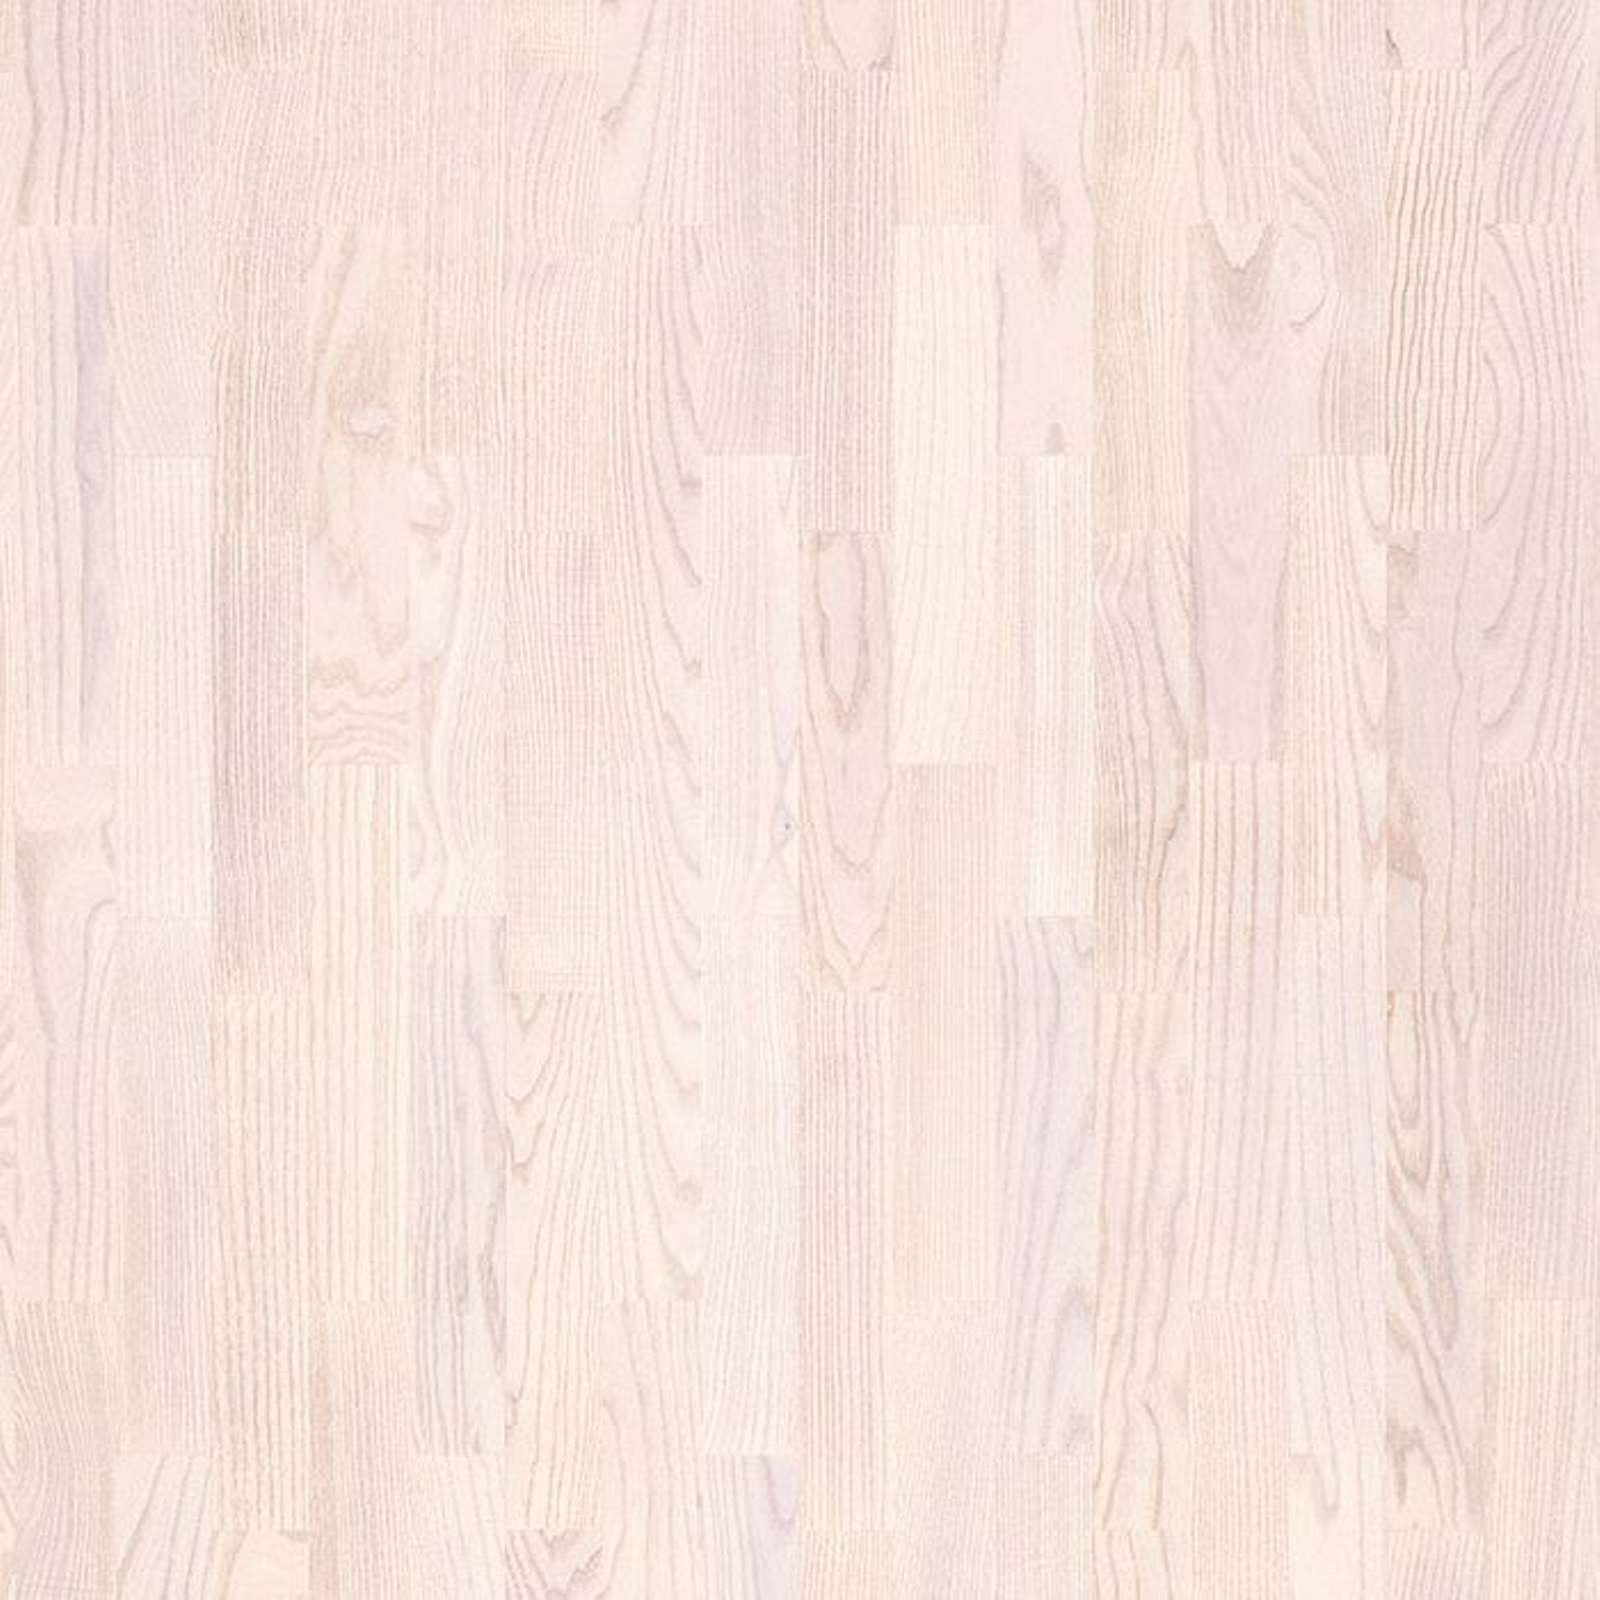 Паркет Tarkett Salsa Premium Ясень Кристалл, 550170008, 2238х194х14мм, (6шт/2.658м2)